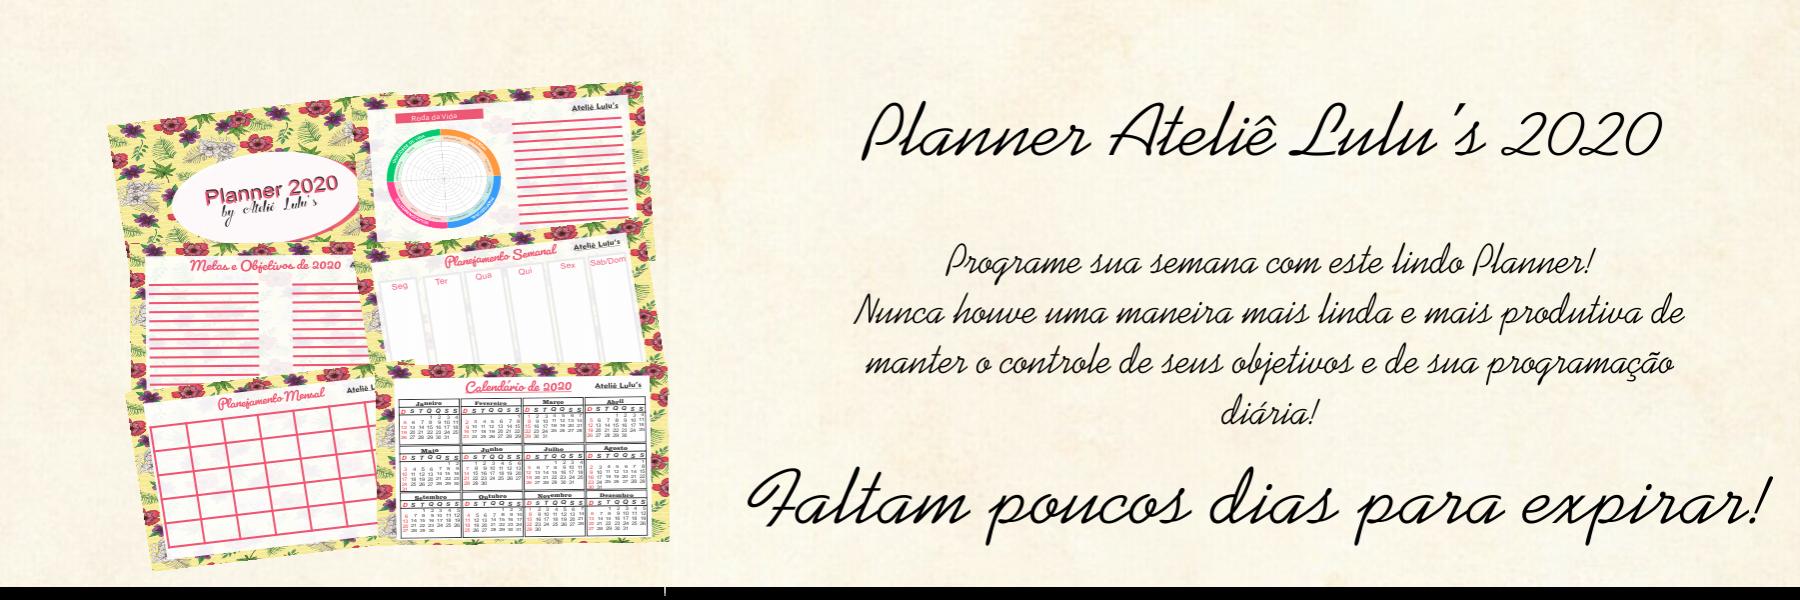 Banner planner site